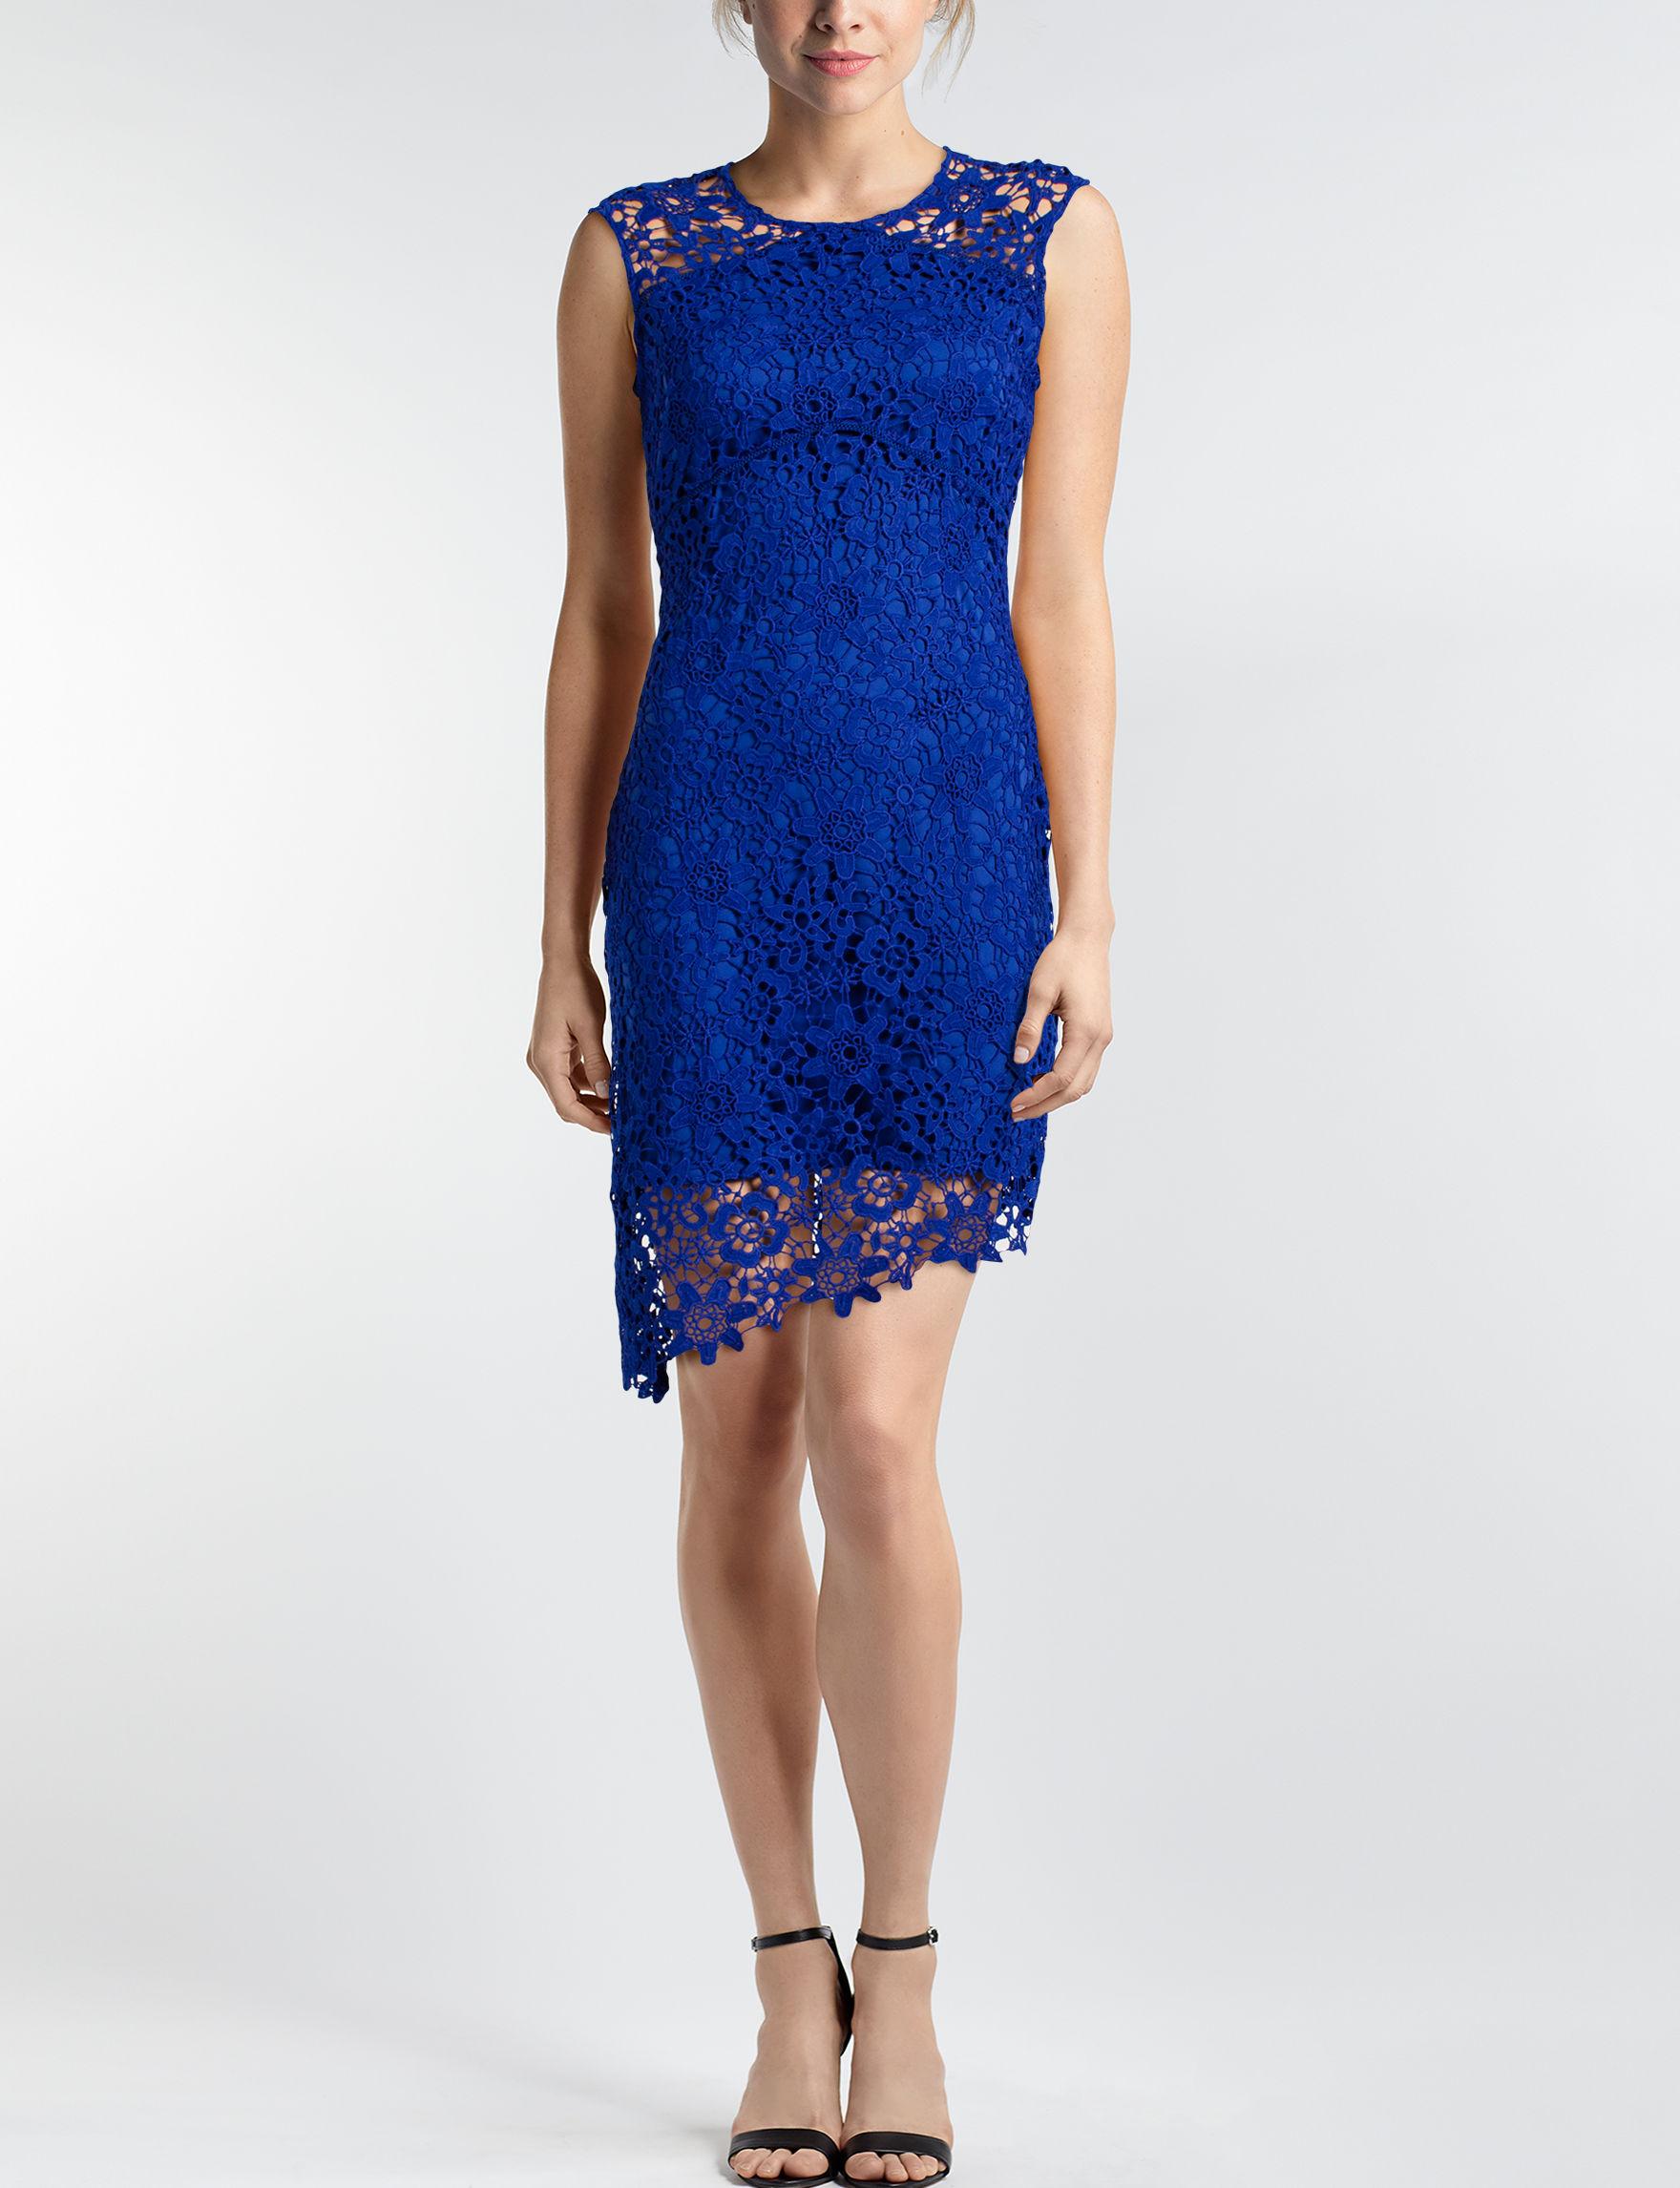 Bebe Blue Evening & Formal Sheath Dresses